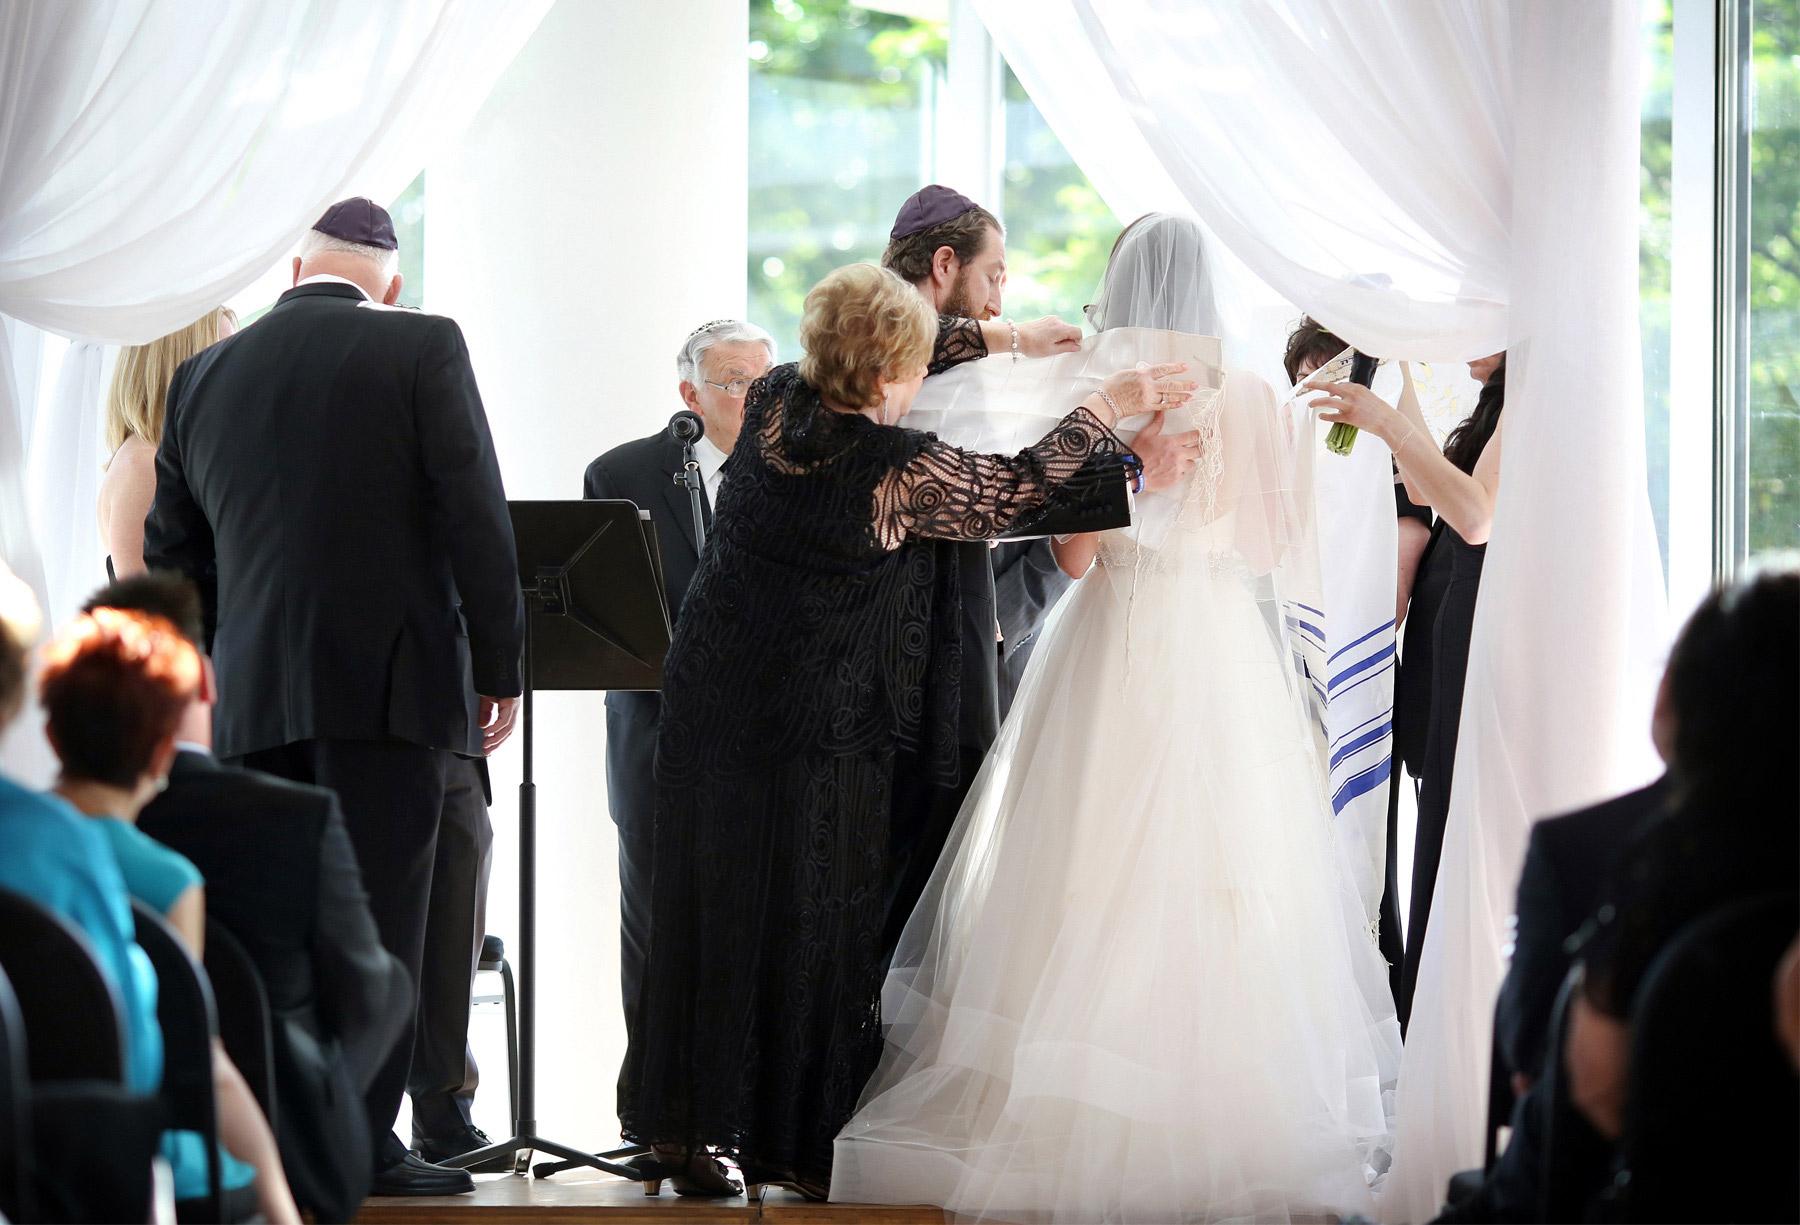 11-Minneapolis-Minnesota-Wedding-Photography-by-Vick-Photography-Hilton-Downtown-Ceremony-Lisa-and-Jared.jpg